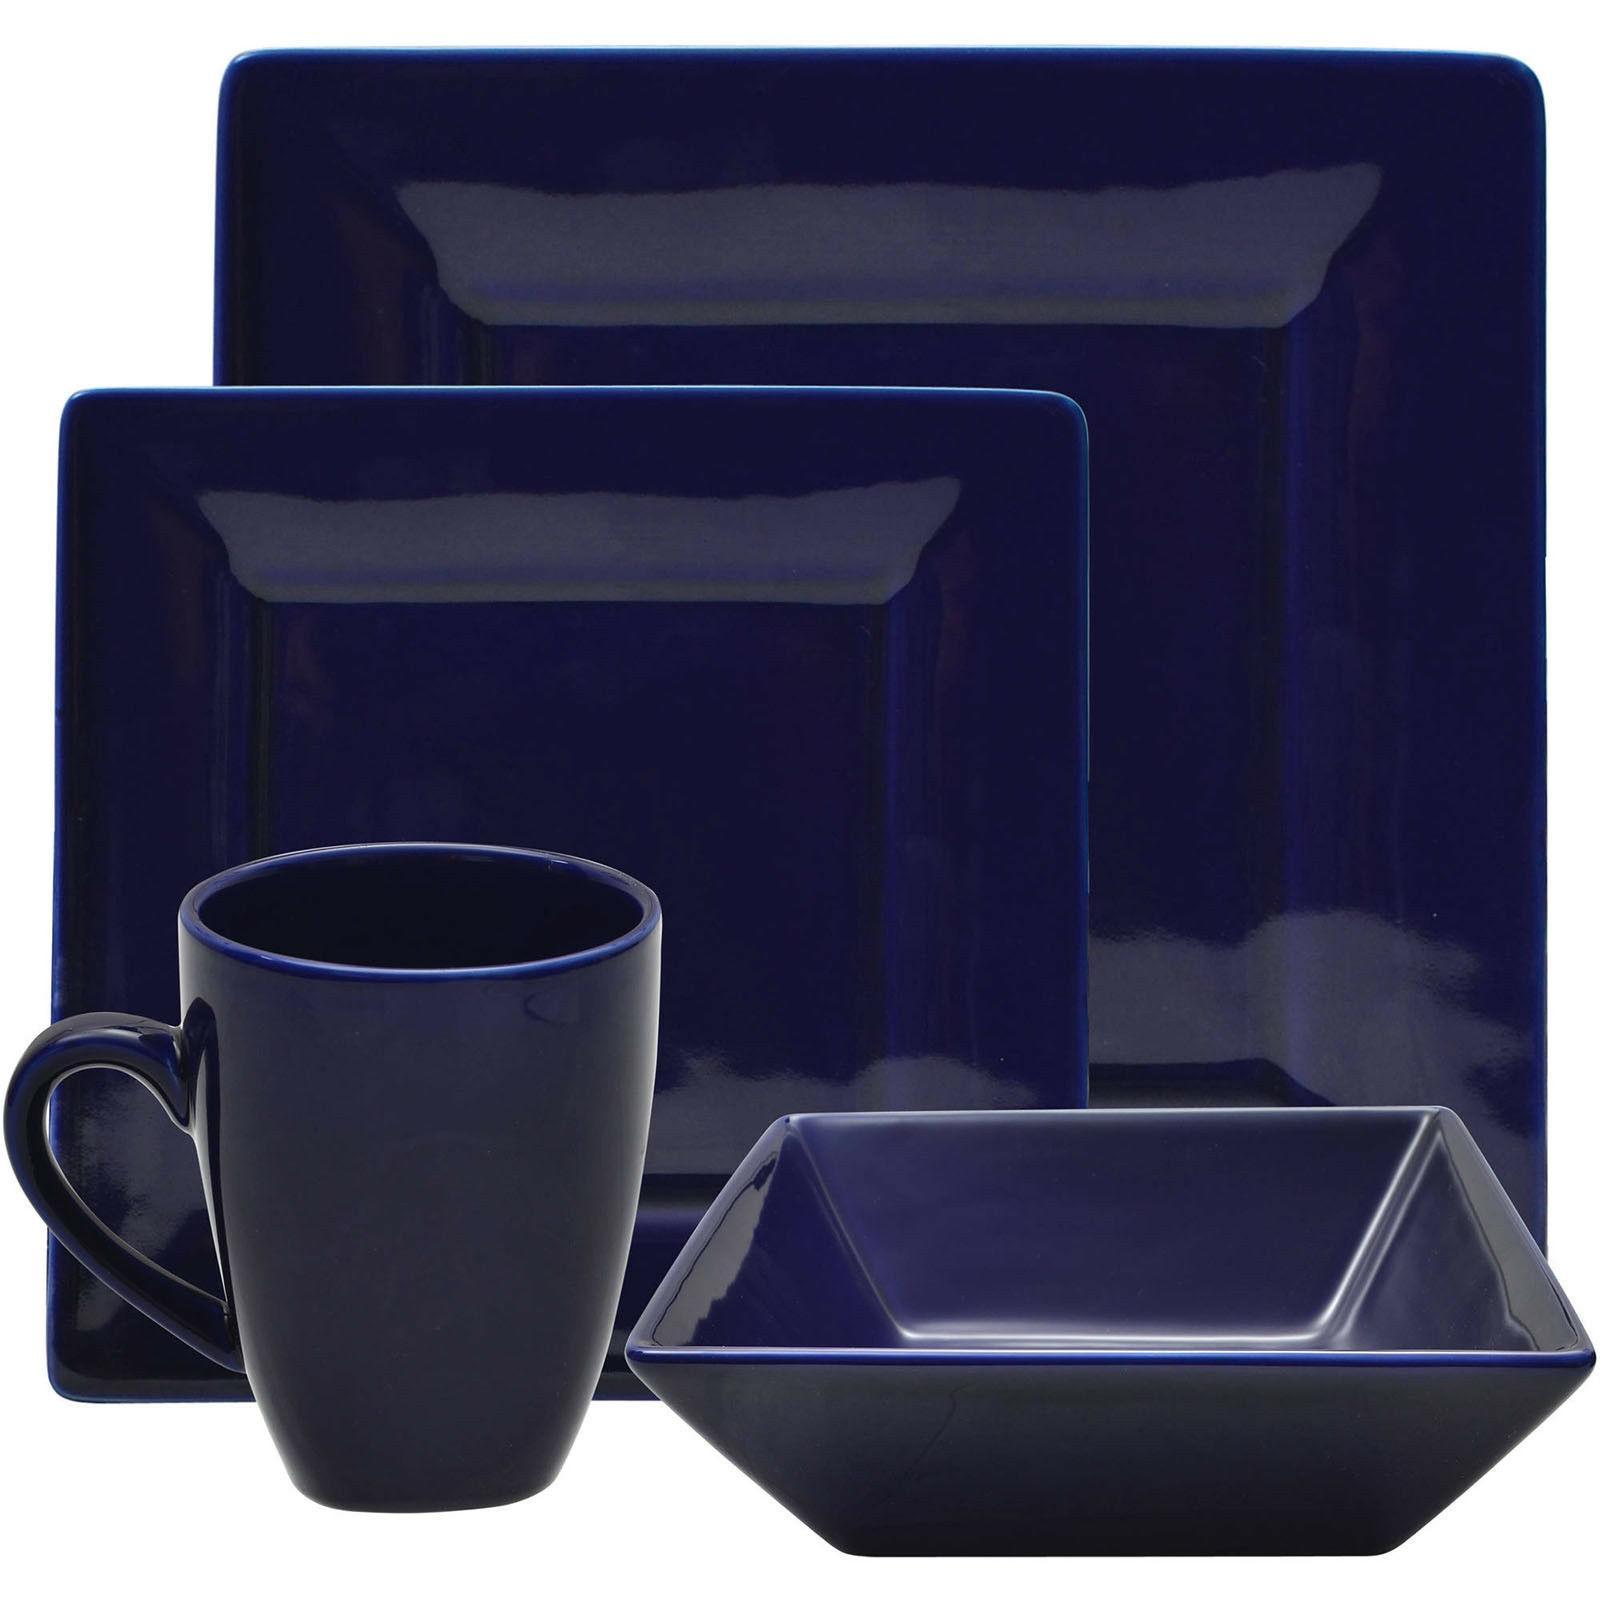 Dinnerware Set Square 16-Piece Porcelain Dishes Bowls